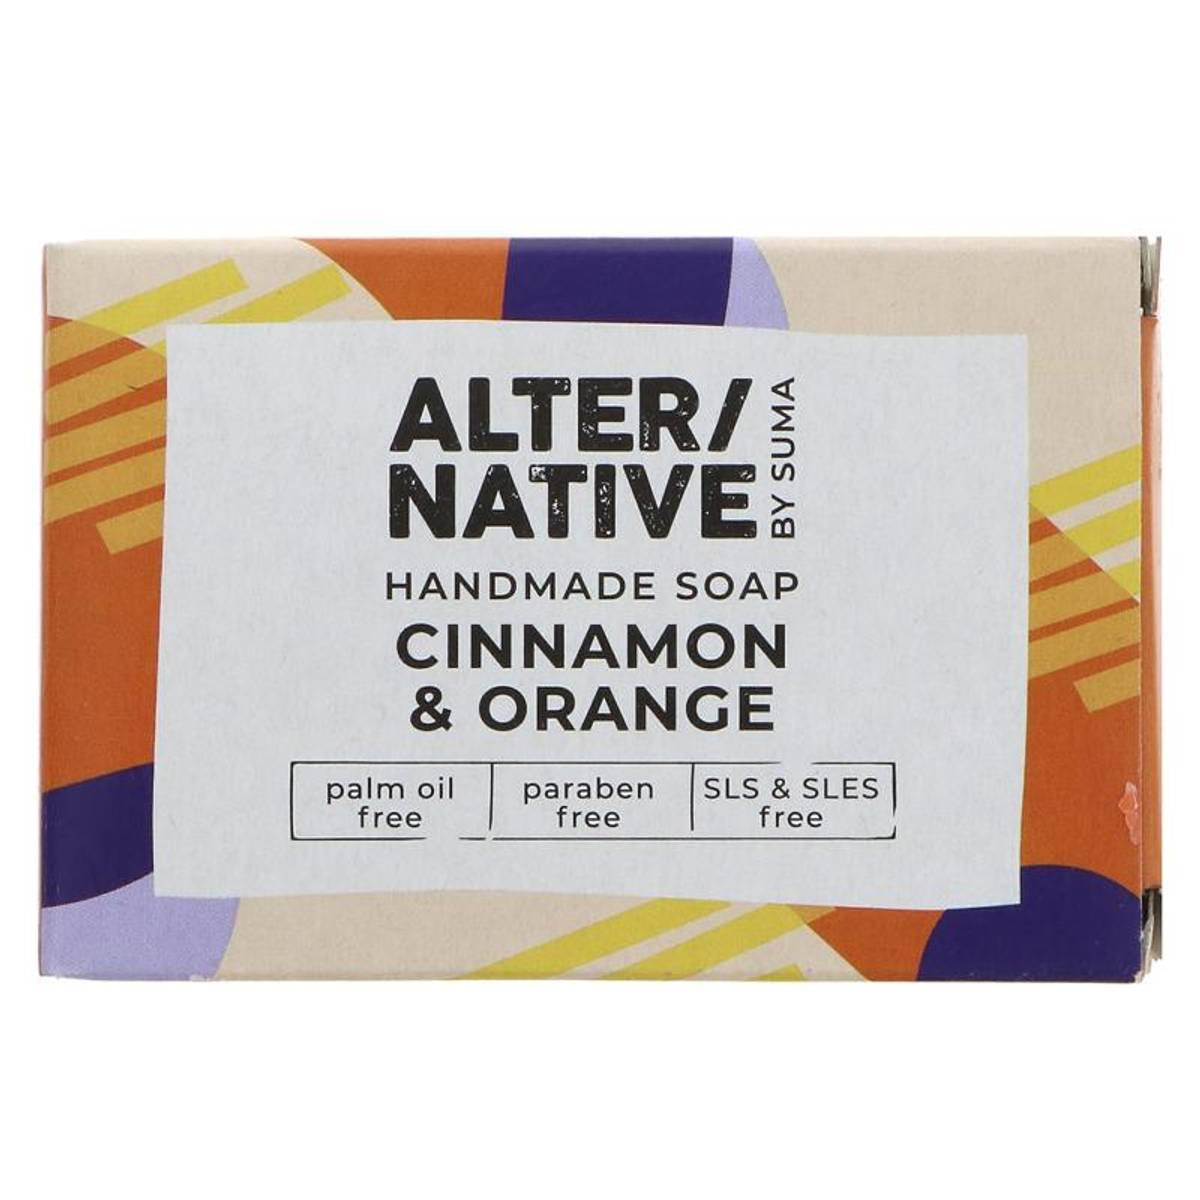 Såpestykke Cinnamon & Orange 95g / Alter/native